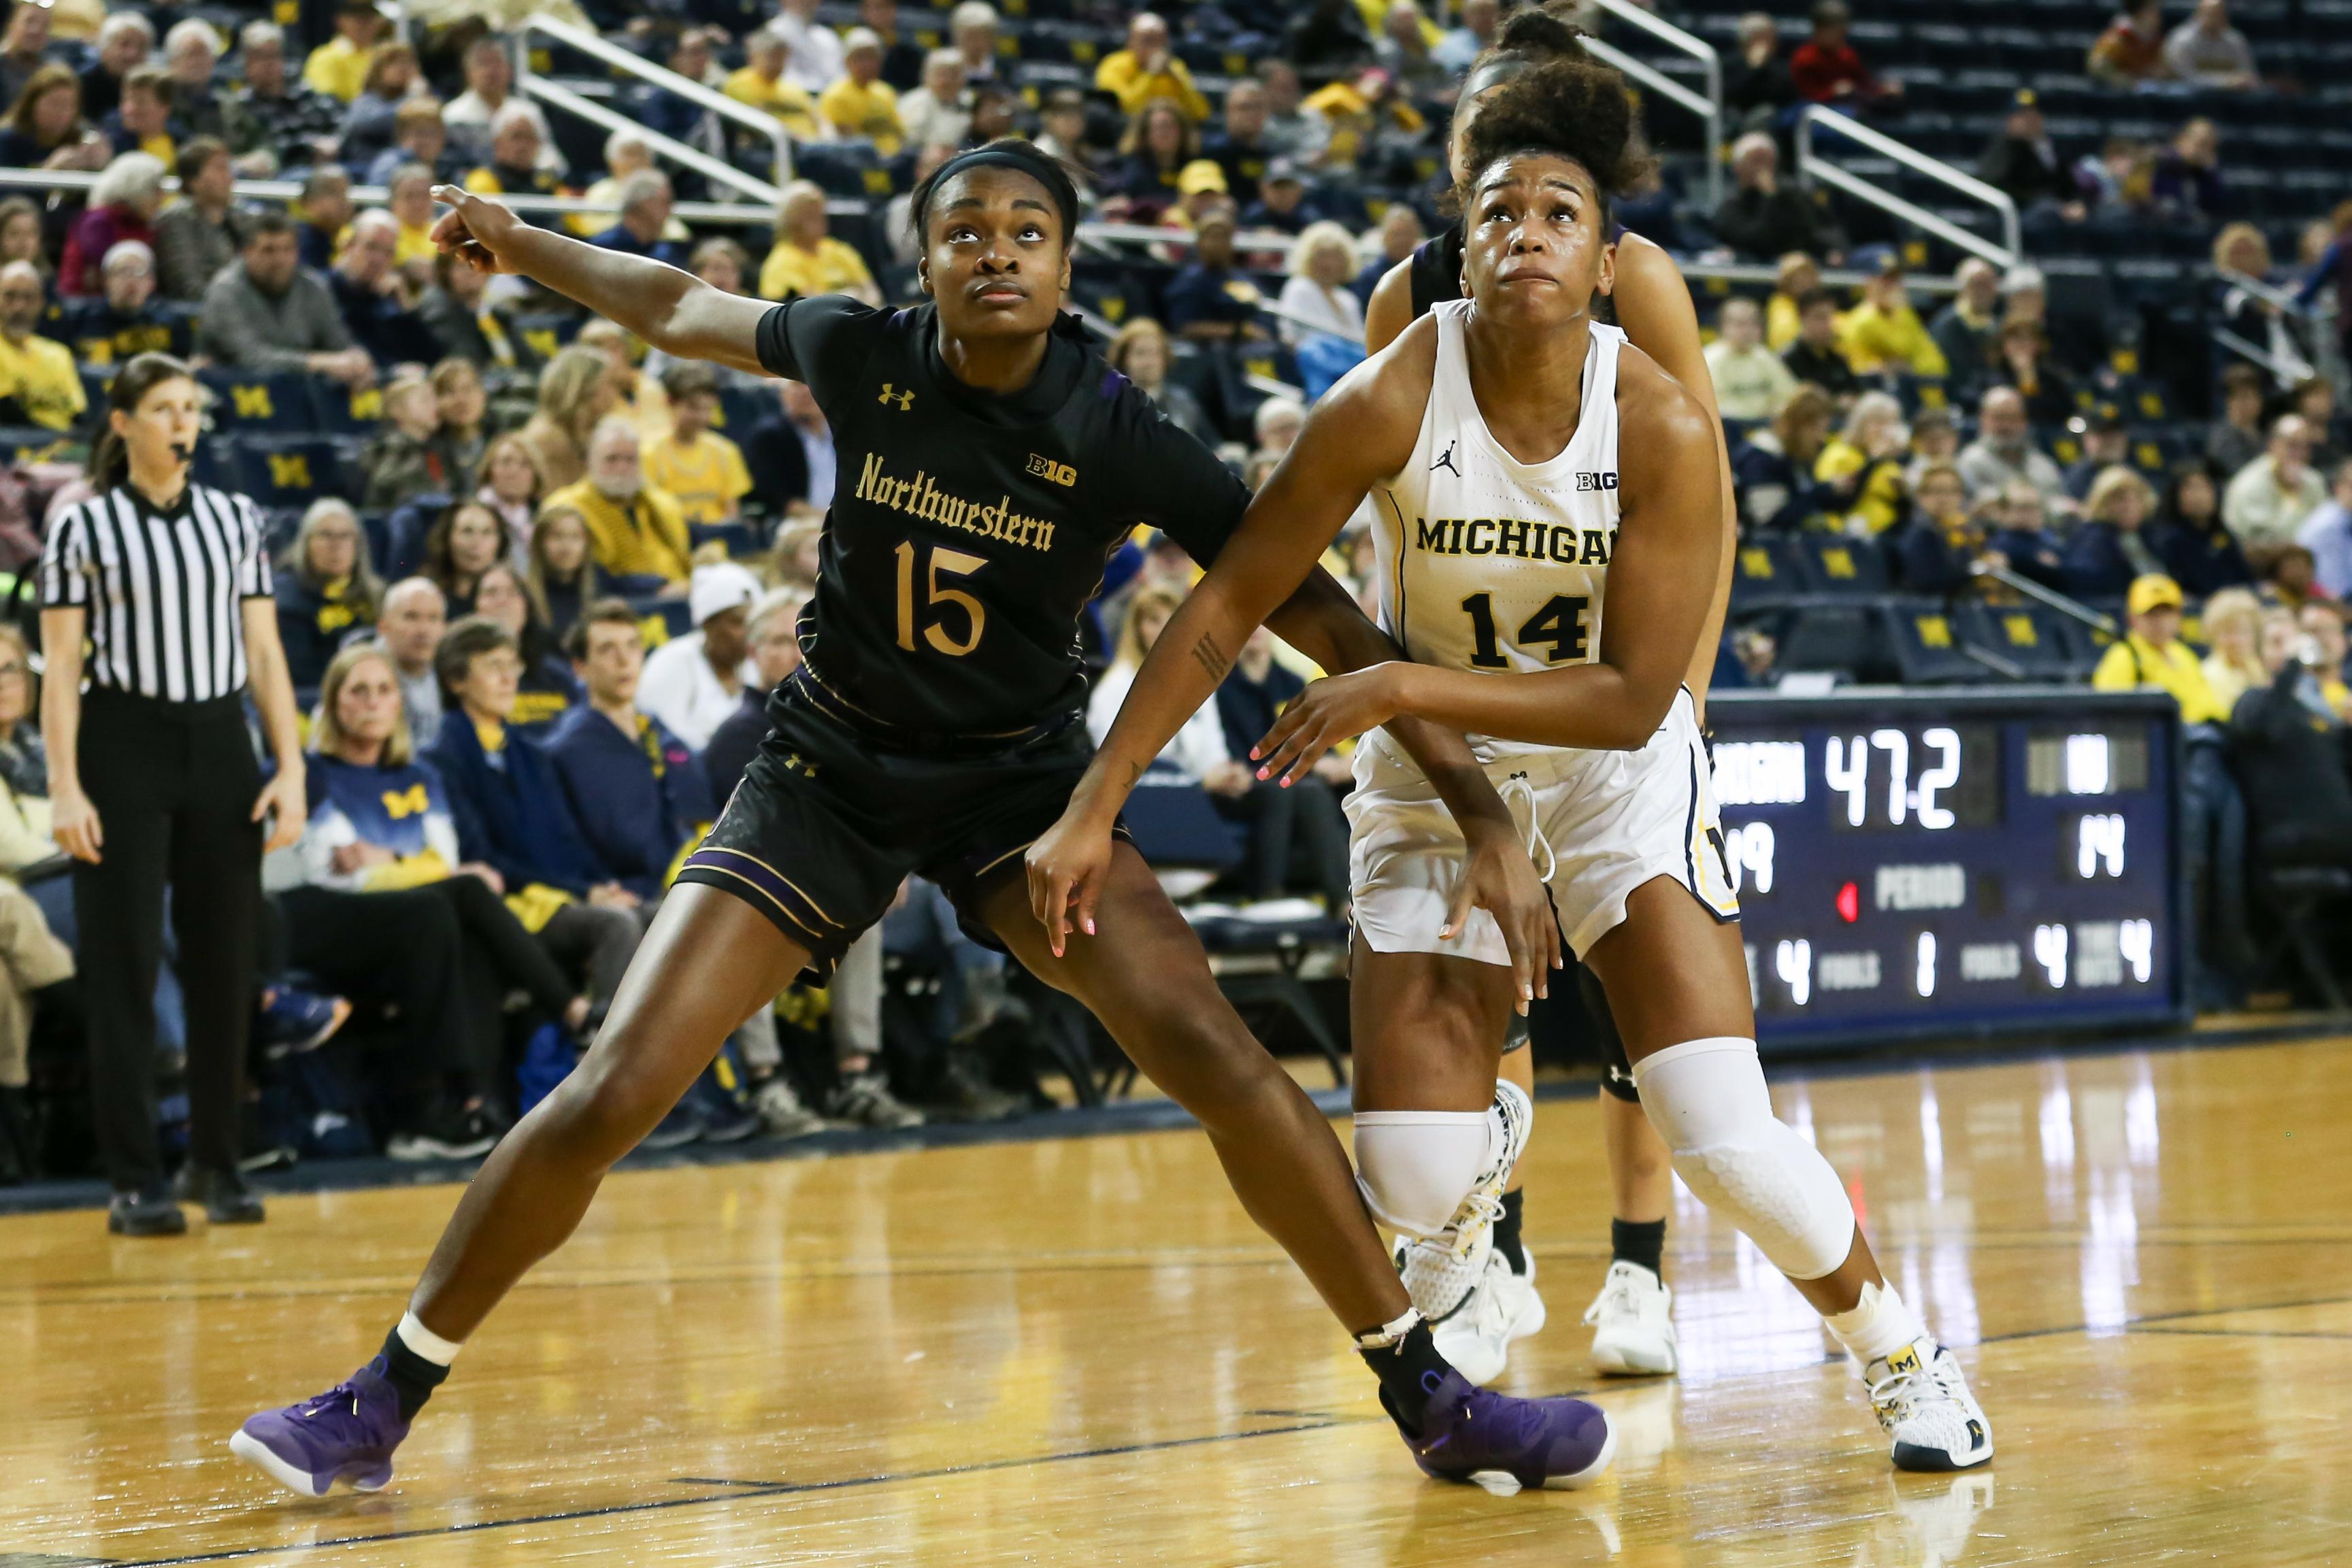 COLLEGE BASKETBALL: FEB 13 Women's Northwestern at Michigan